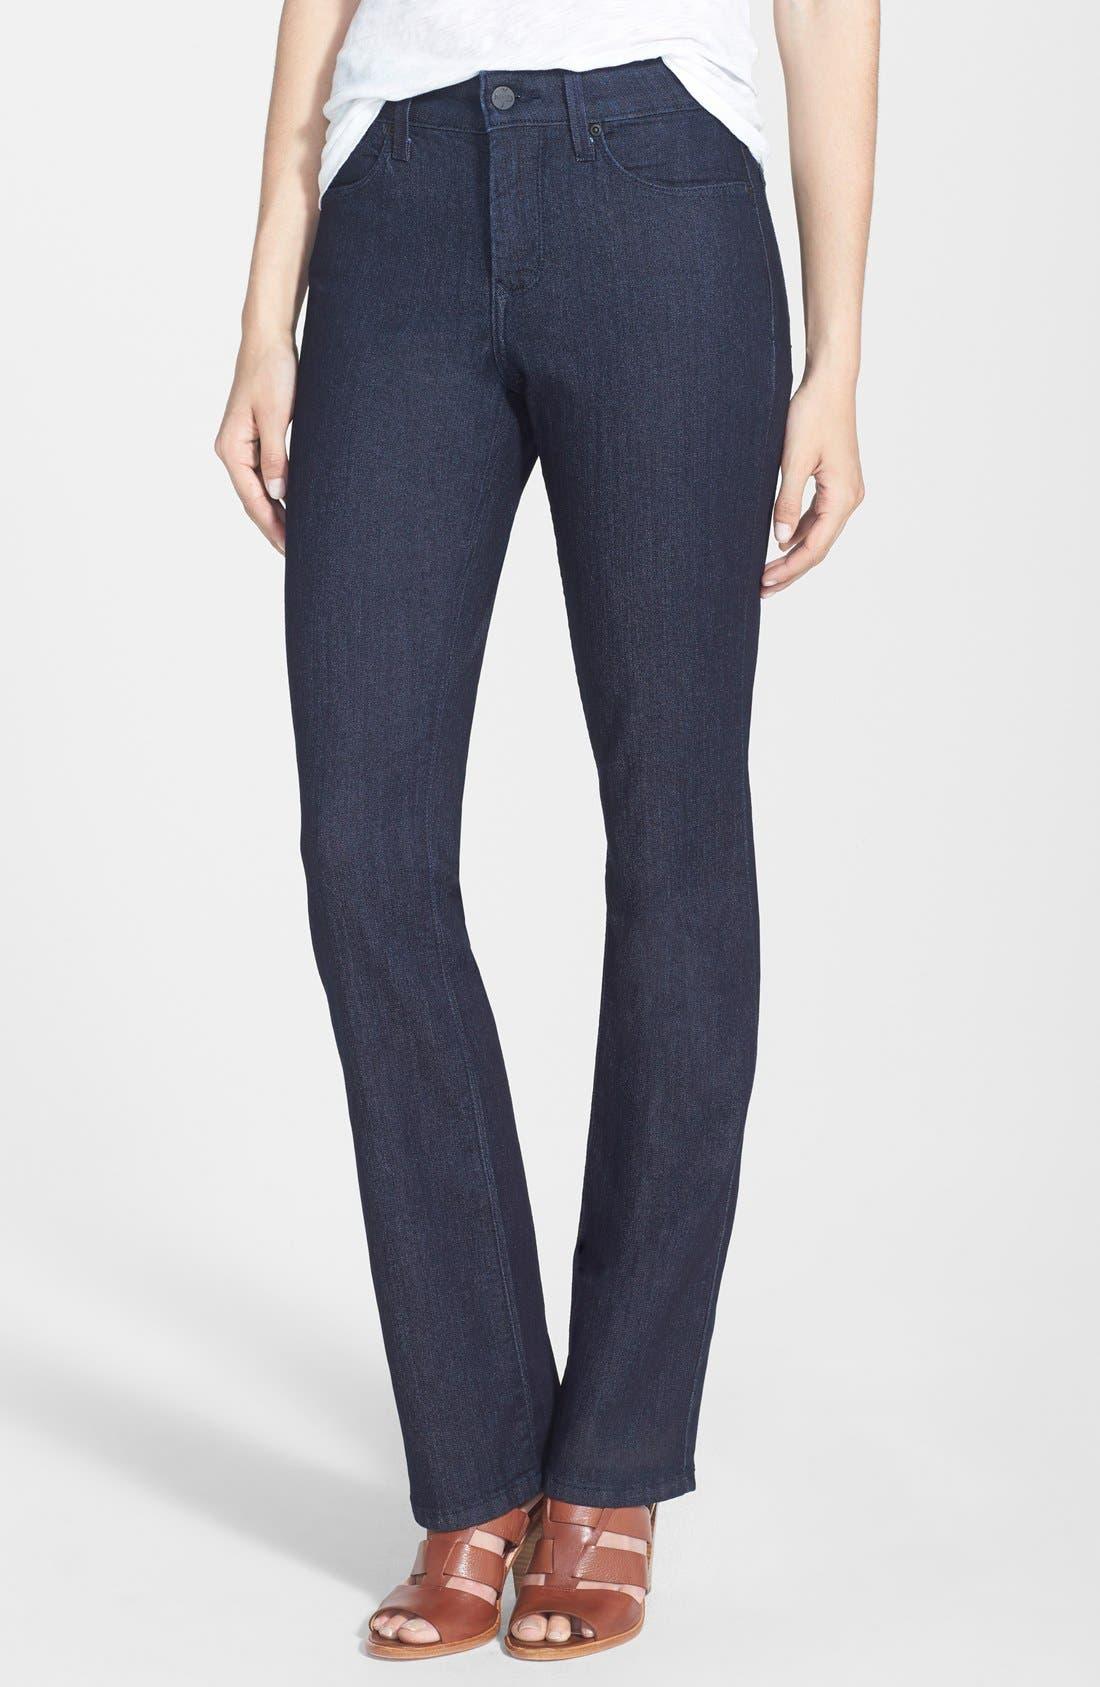 NYDJ Womens Billie Ankle Bootcut Jeans